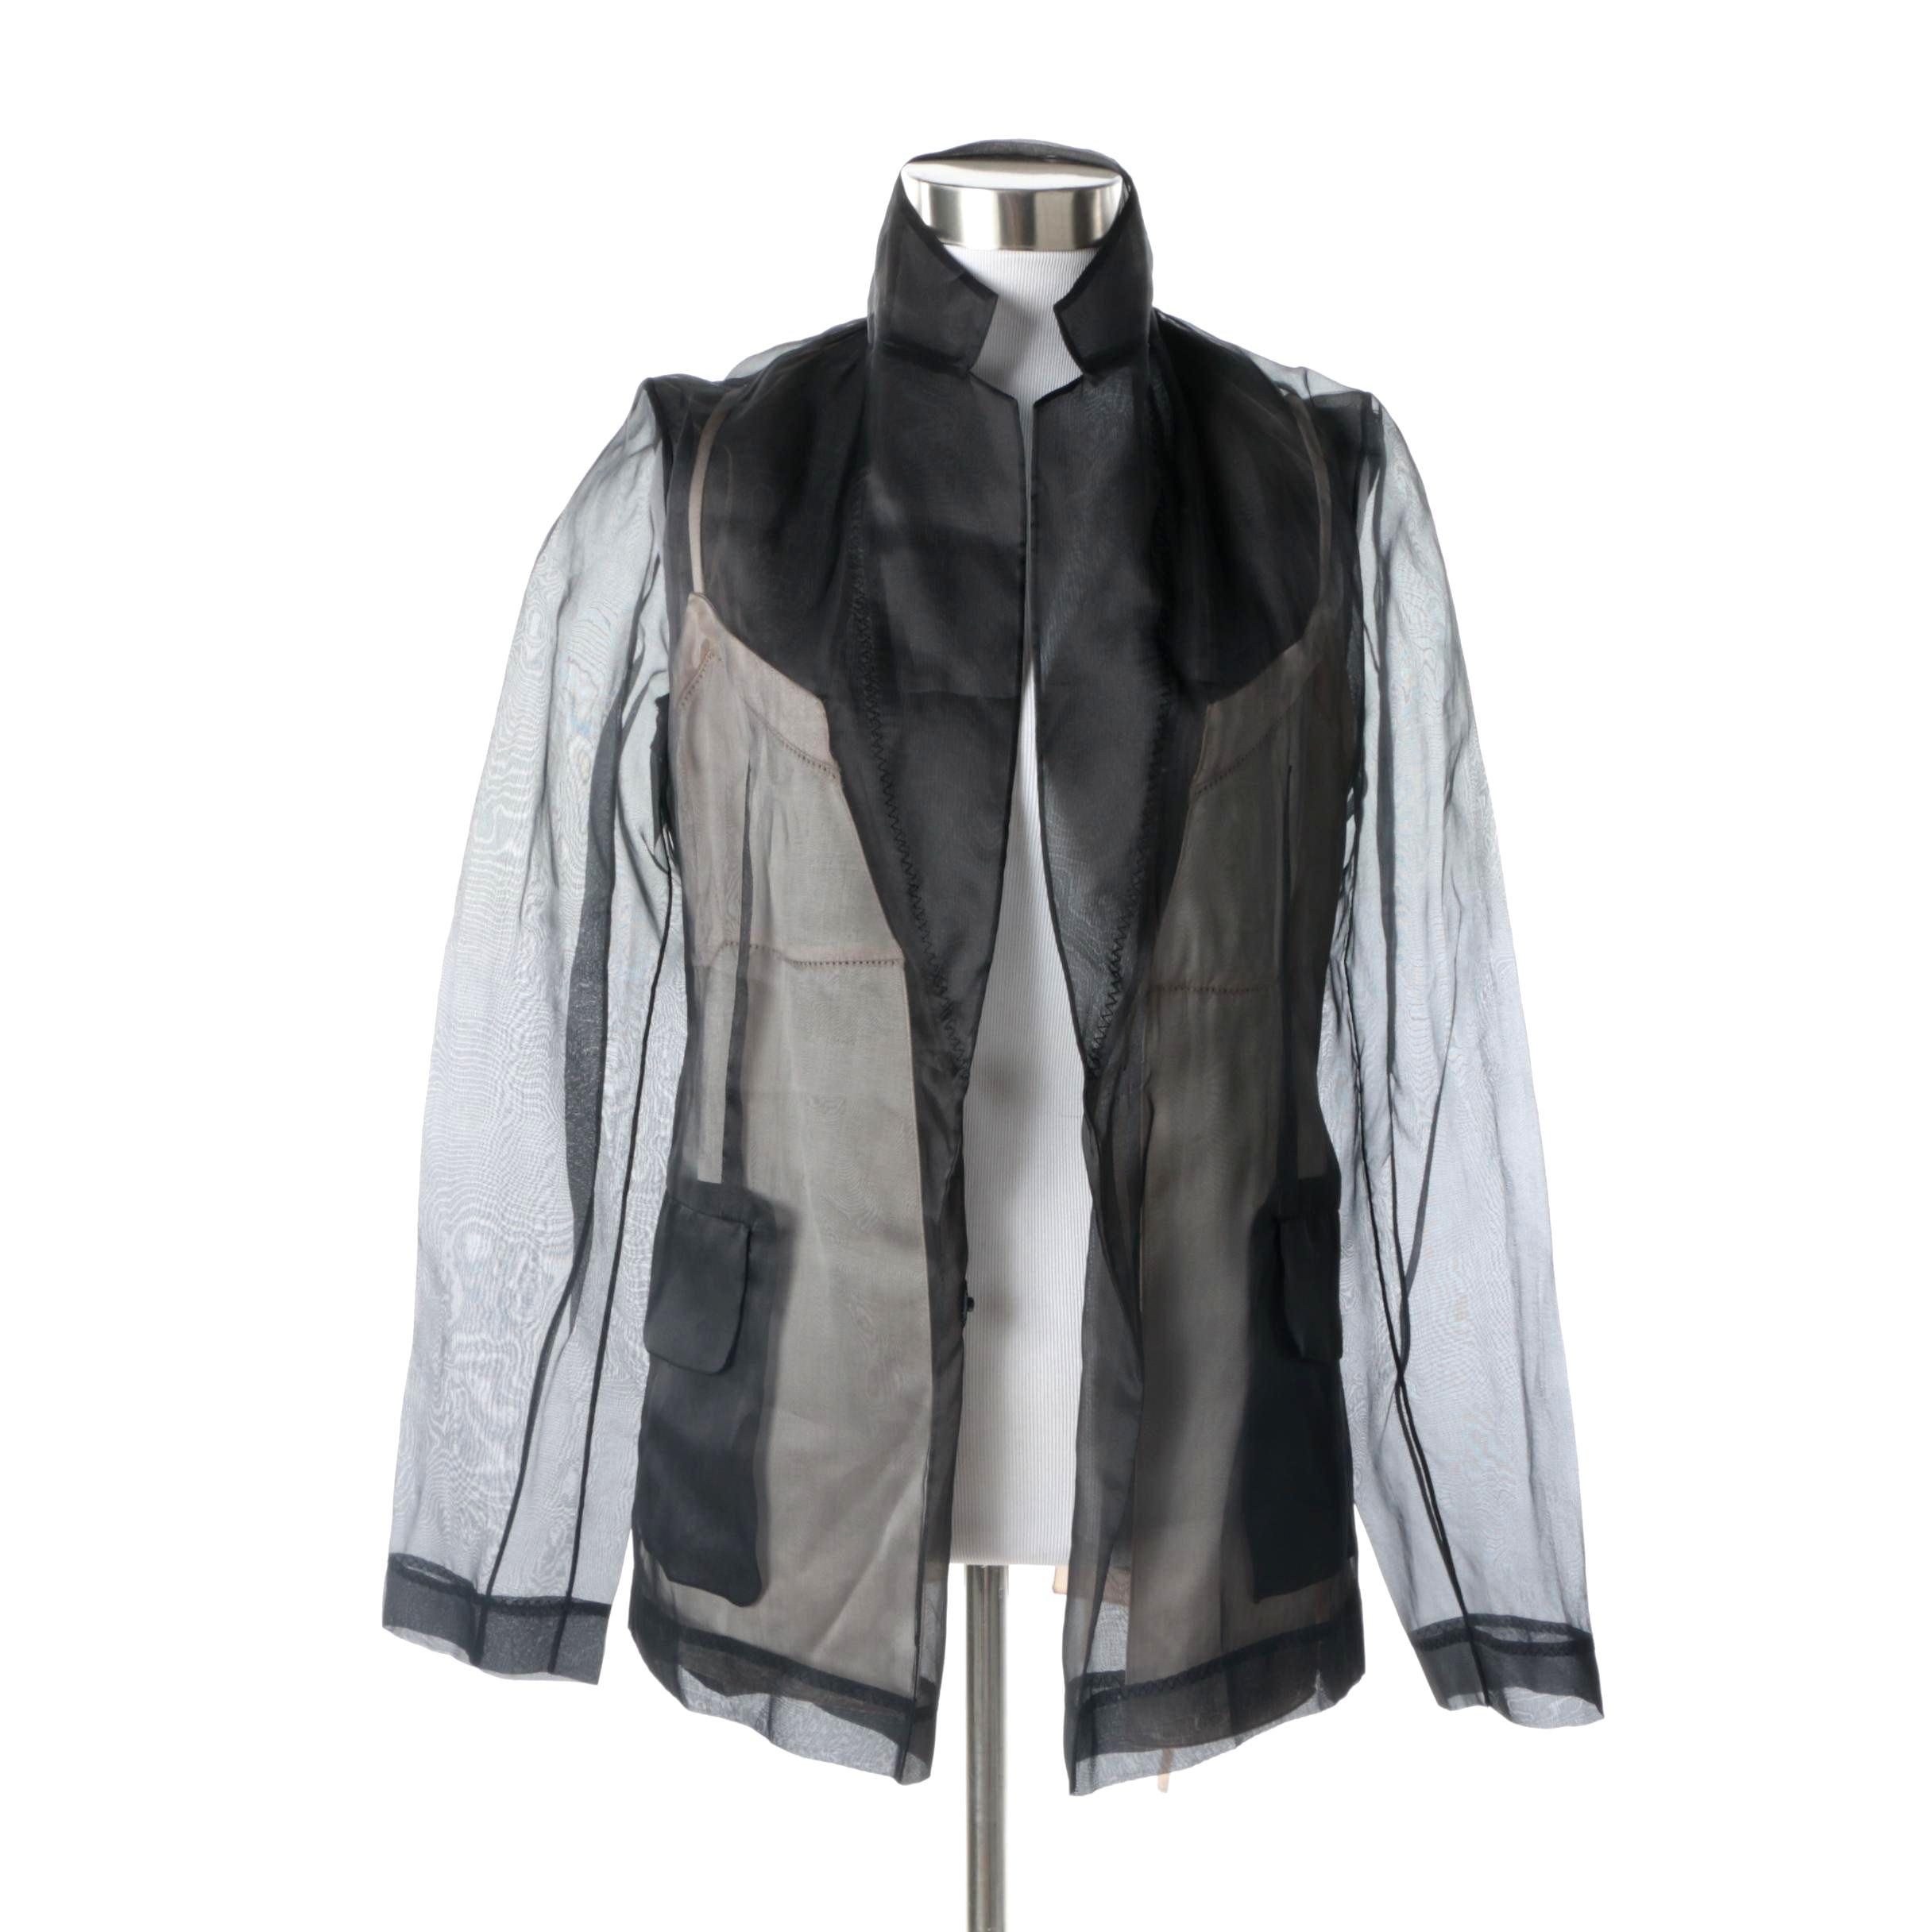 2016 Maison Margiela Black Silk Organza Jacket